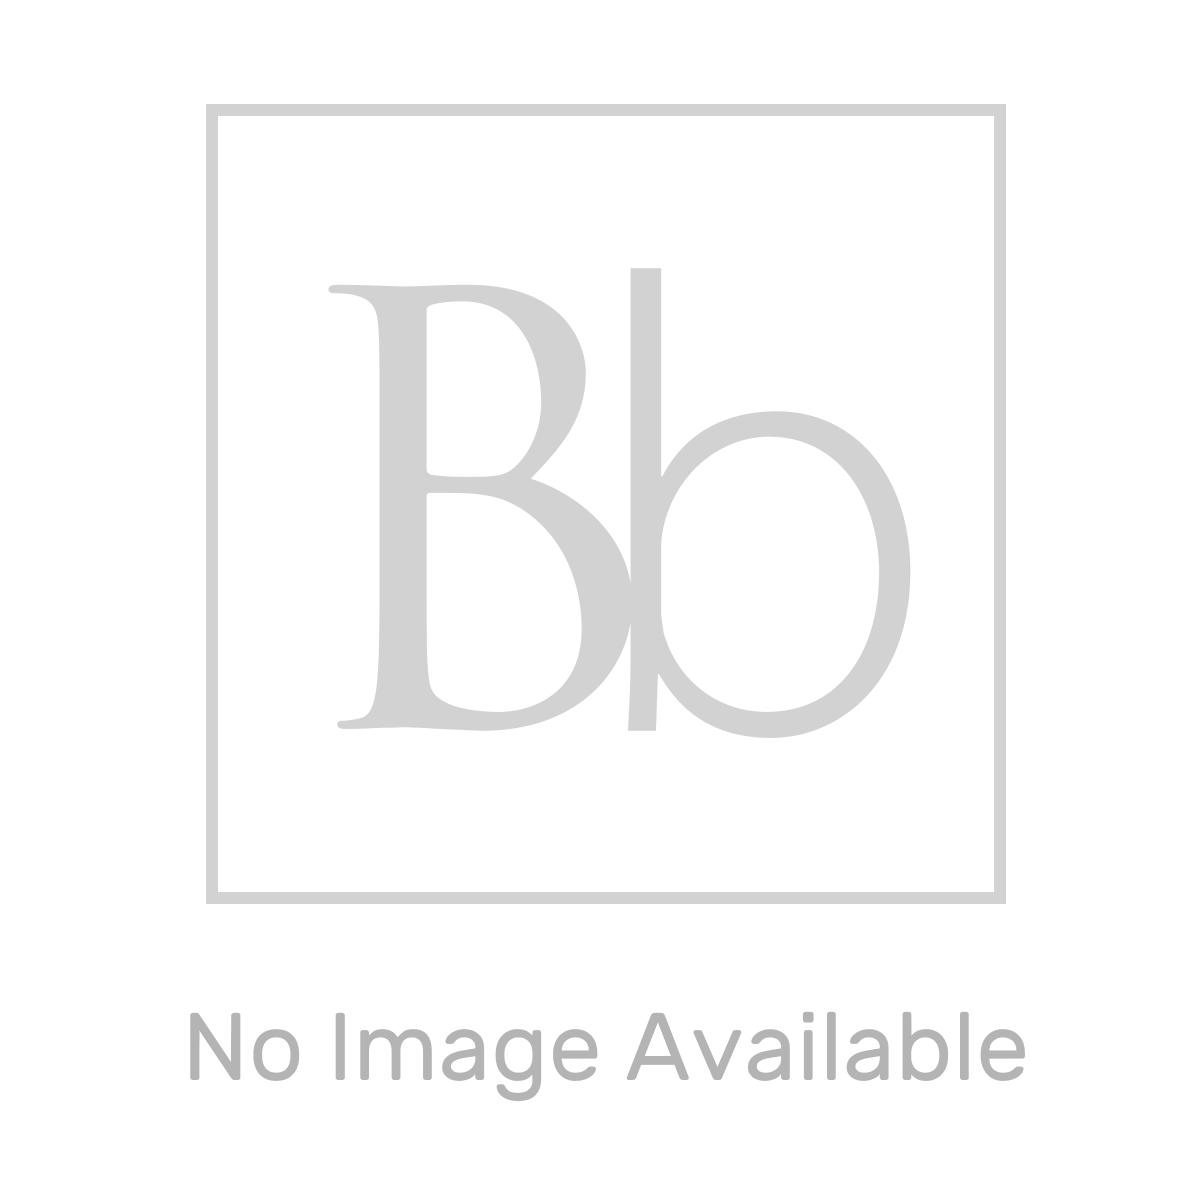 Nuie Athena Stone Grey 2 Door Floor Standing Vanity Unit with 18mm Profile Basin 600mm Line Drawing